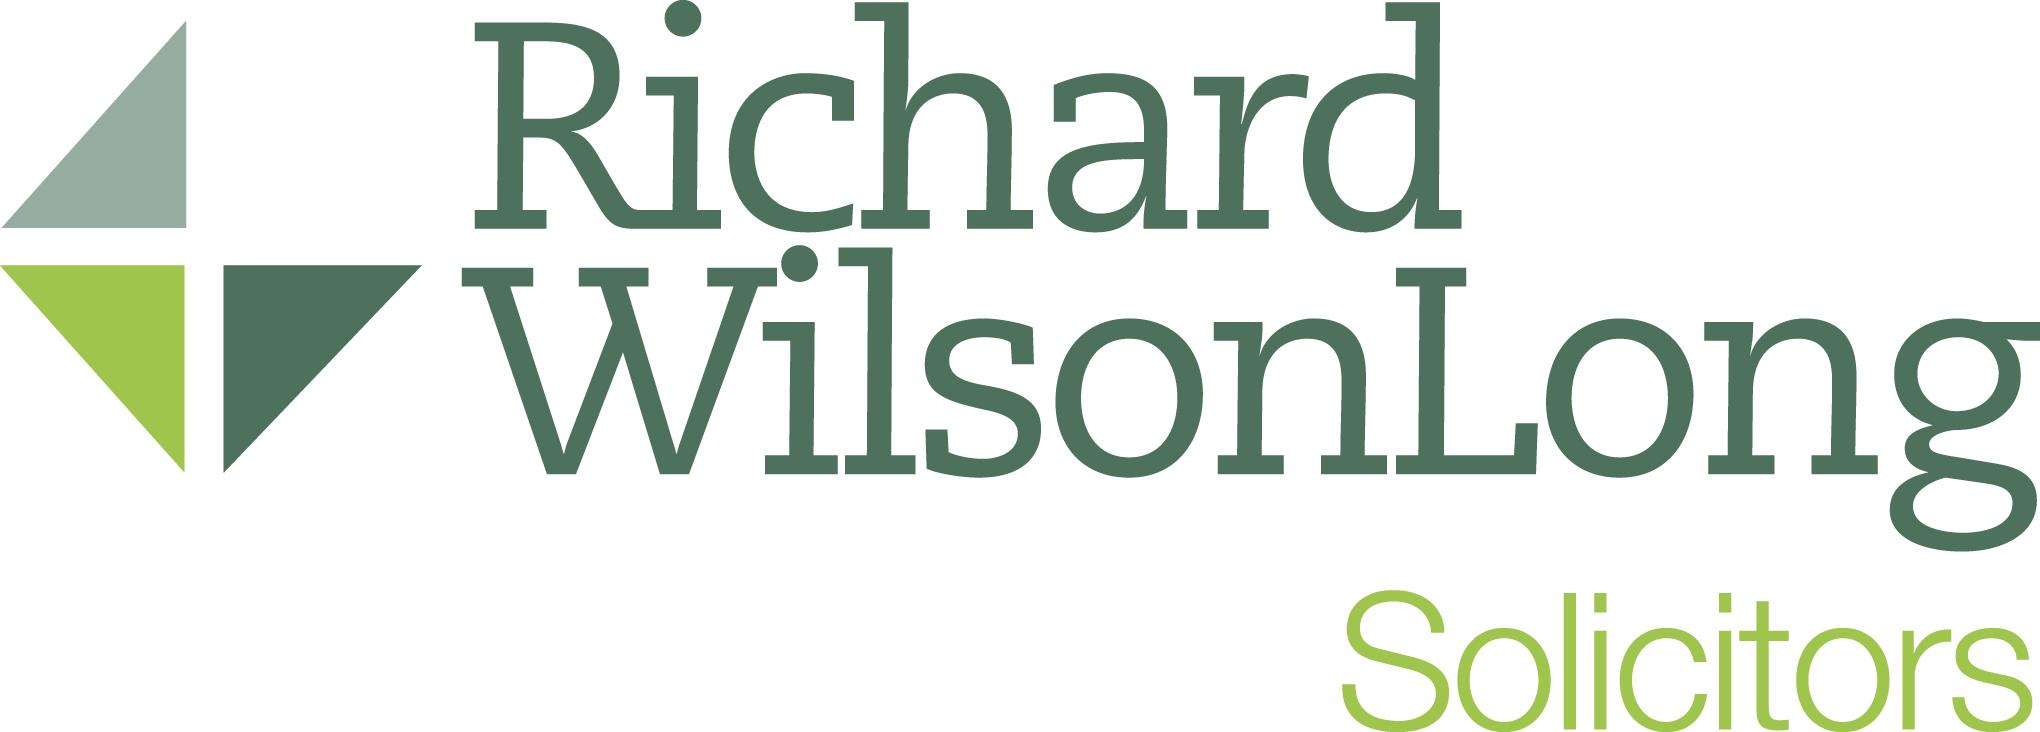 Richard Wilson Long new logo 2012